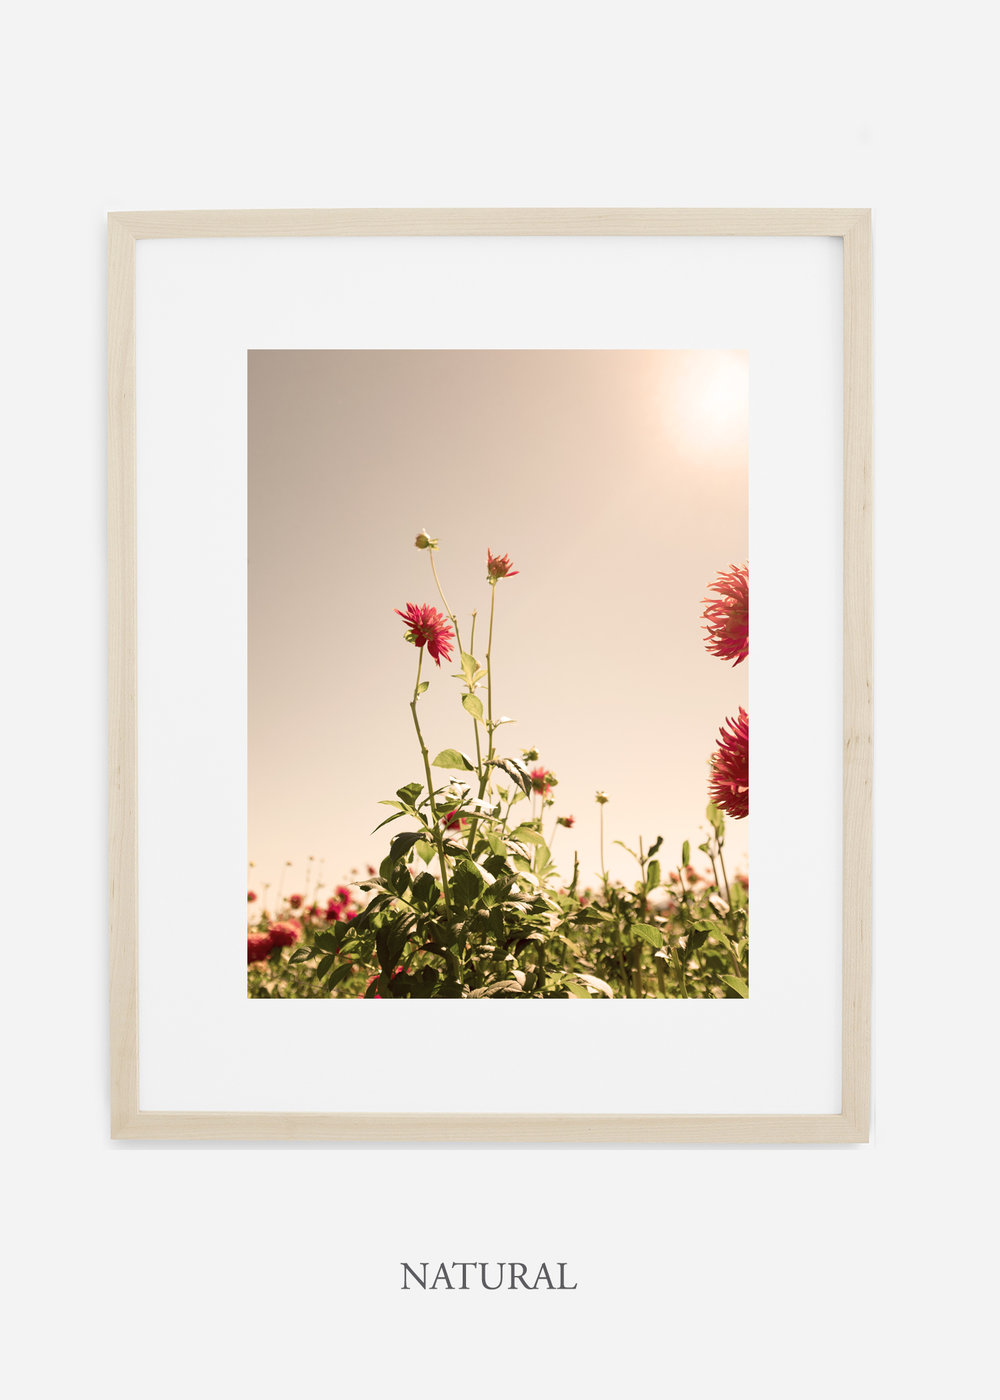 DahliaNo.2_naturalframe__mat_interiordesign_botanicalprint_art.jpg